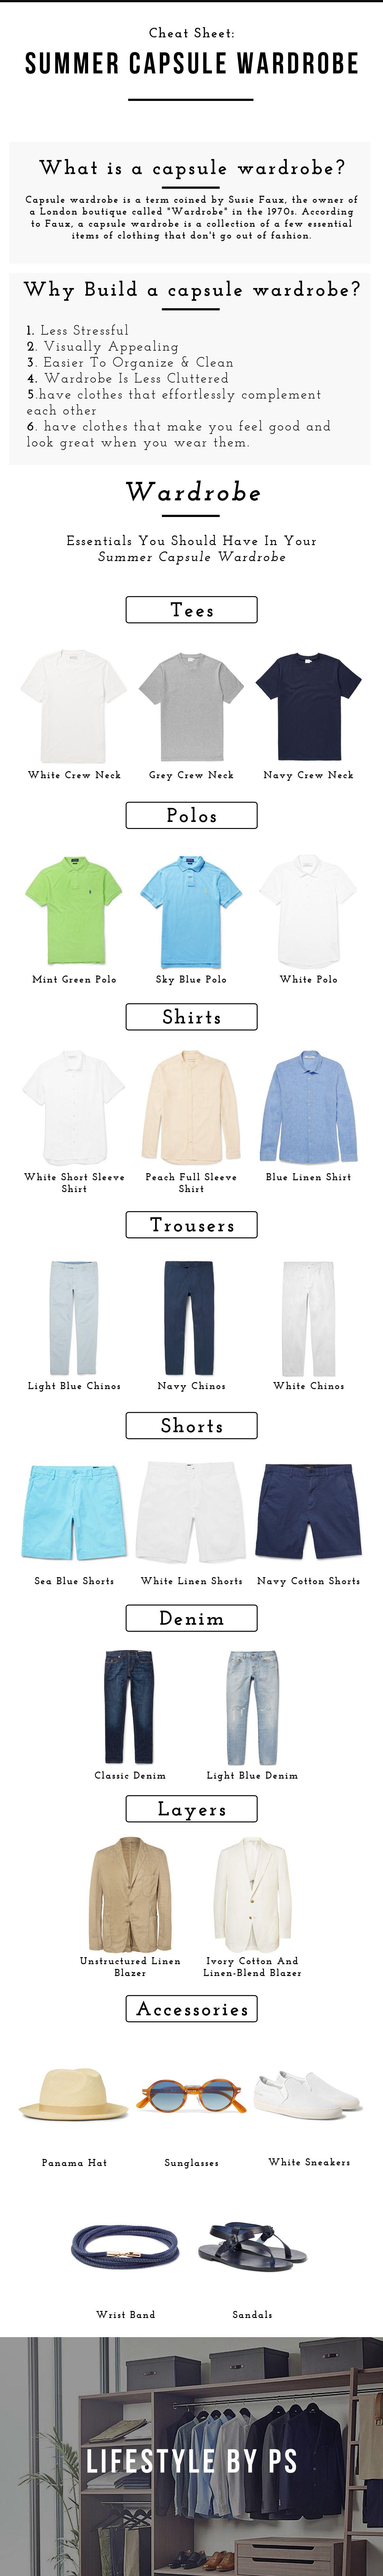 your summer capsule wardrobe sorted capsule wardrobe